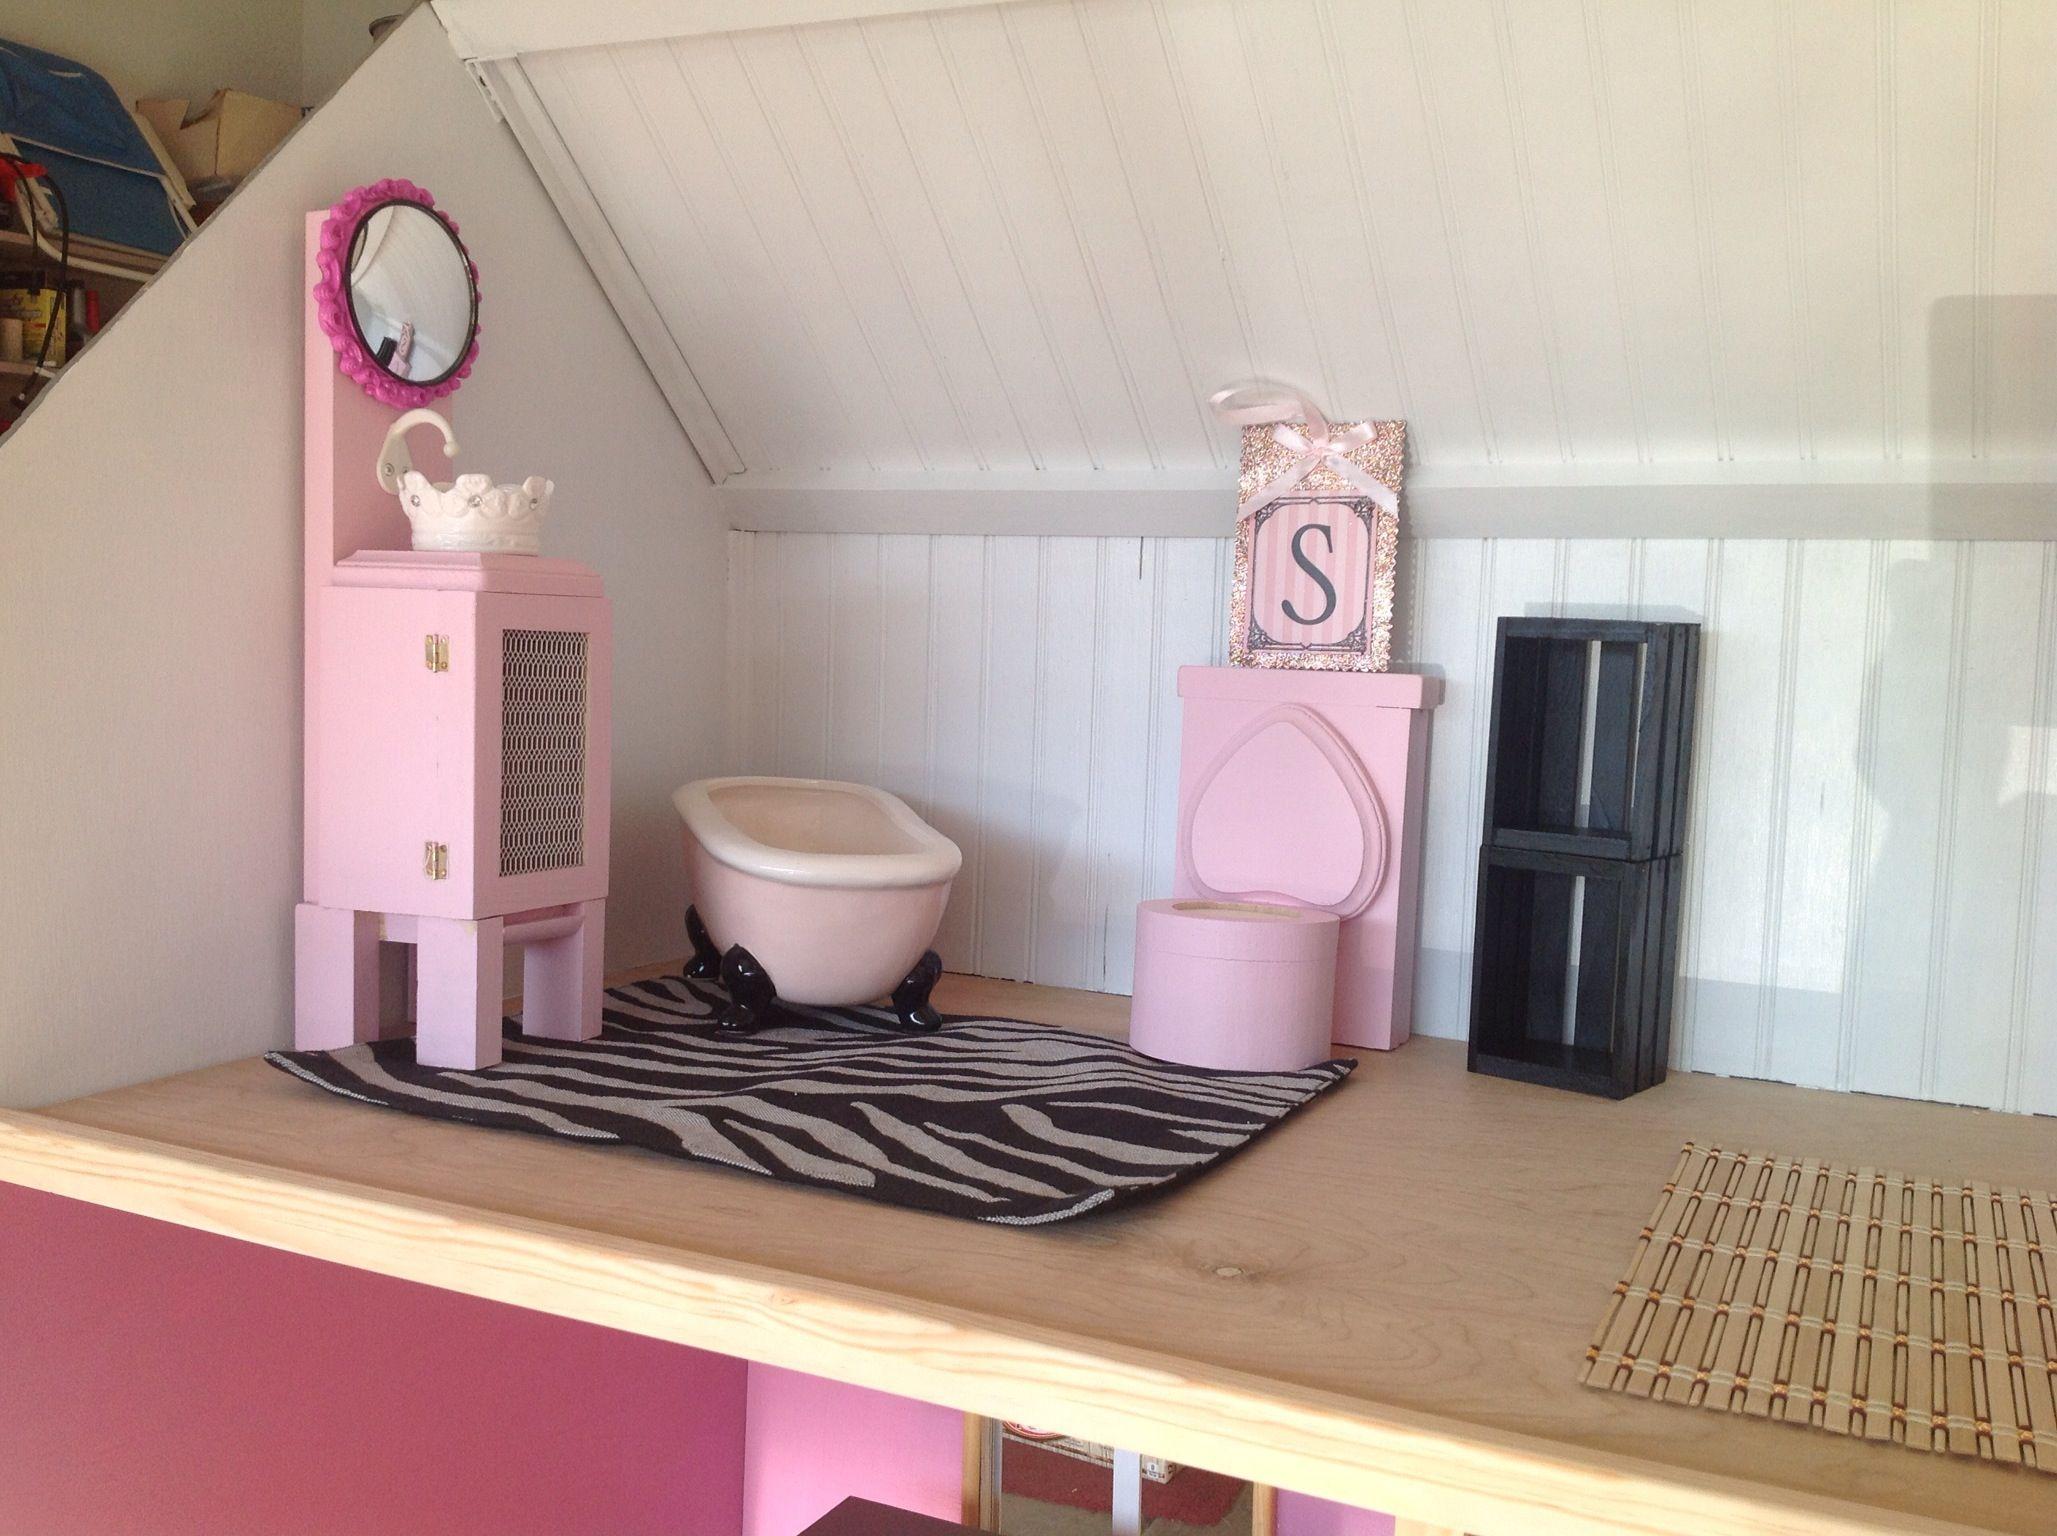 Bathroom American Girl DIY American Girl Dolls Crafts Pinterest